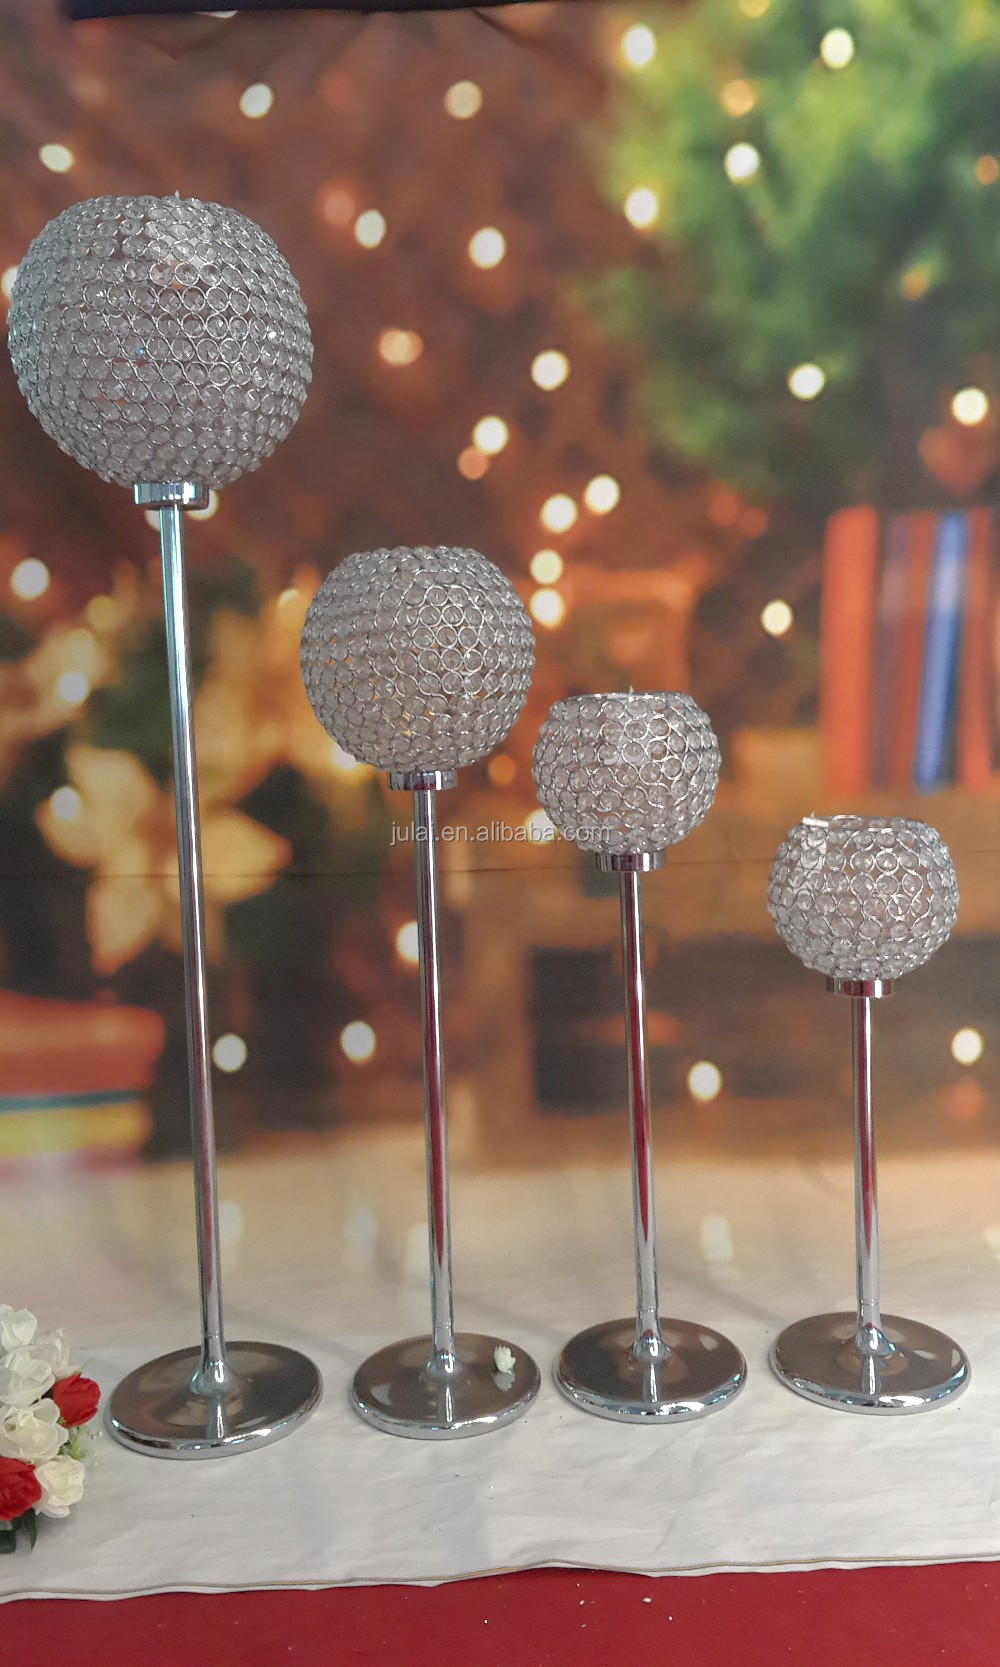 Tall crystal ball wedding candelabra centerpiece and